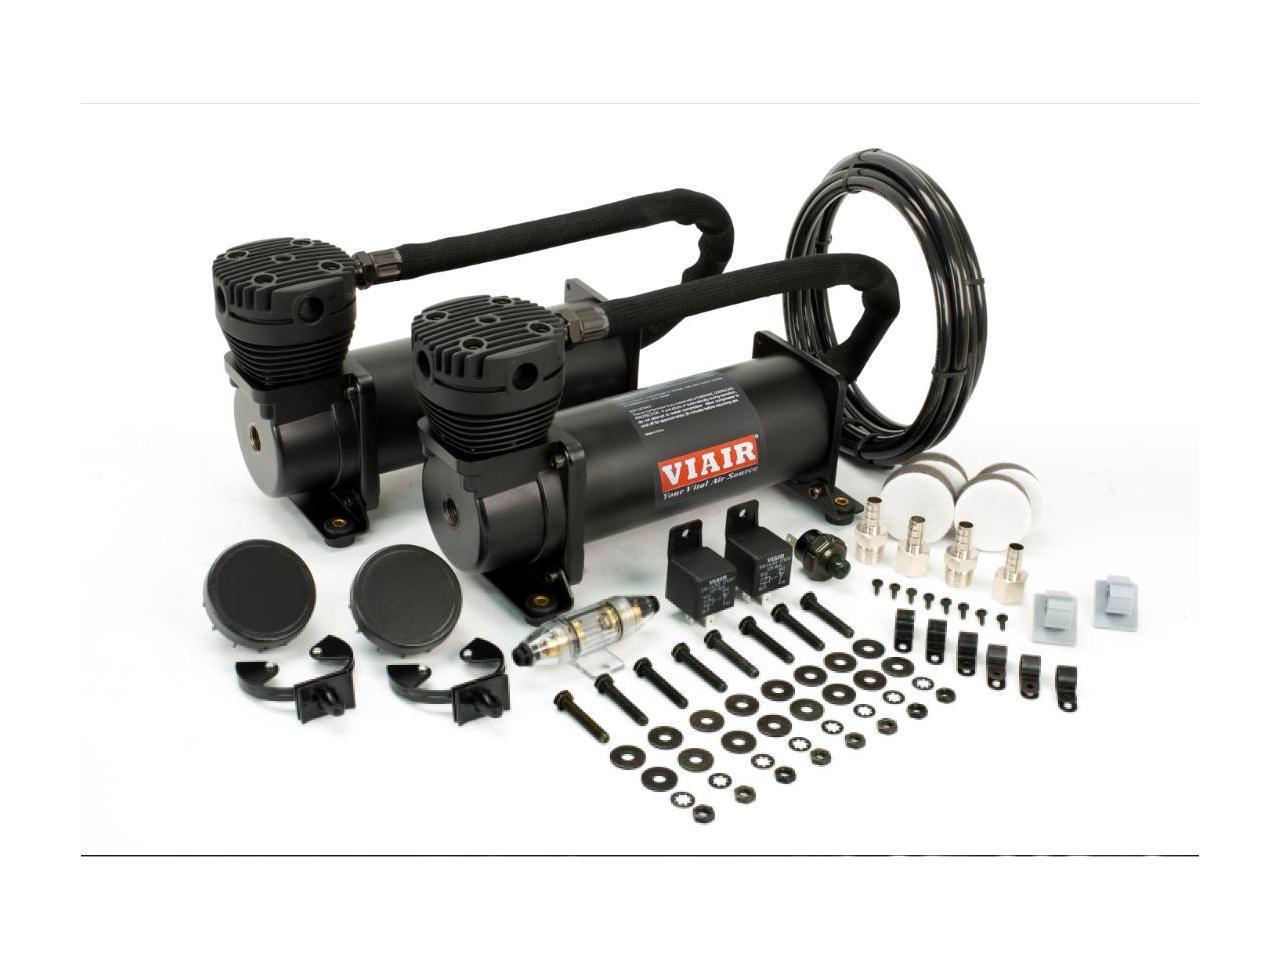 Viair Dual Stealth Black 480c Value Pack  200 Psi  480c  2